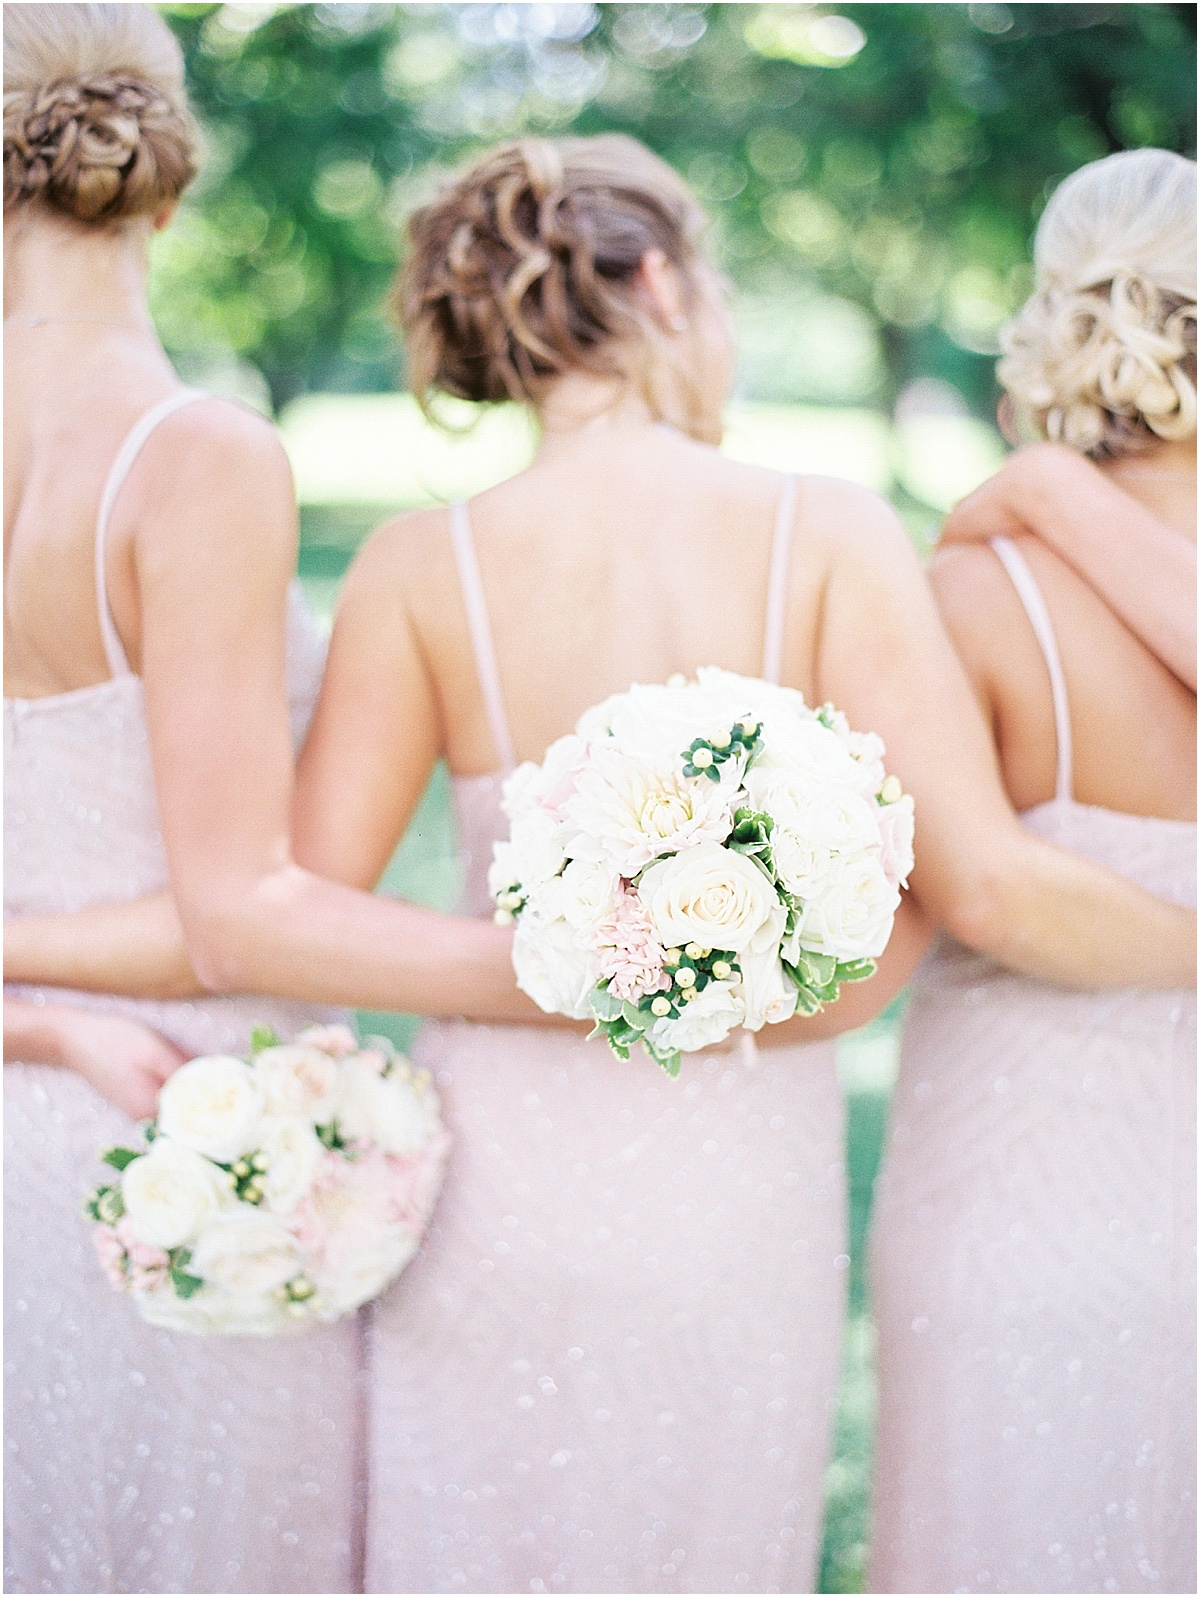 St_Louis_Wedding_Fine_Art_Film_Photographer_Jordan_Brittley_(www.jordanbrittley.com)_0045.jpg